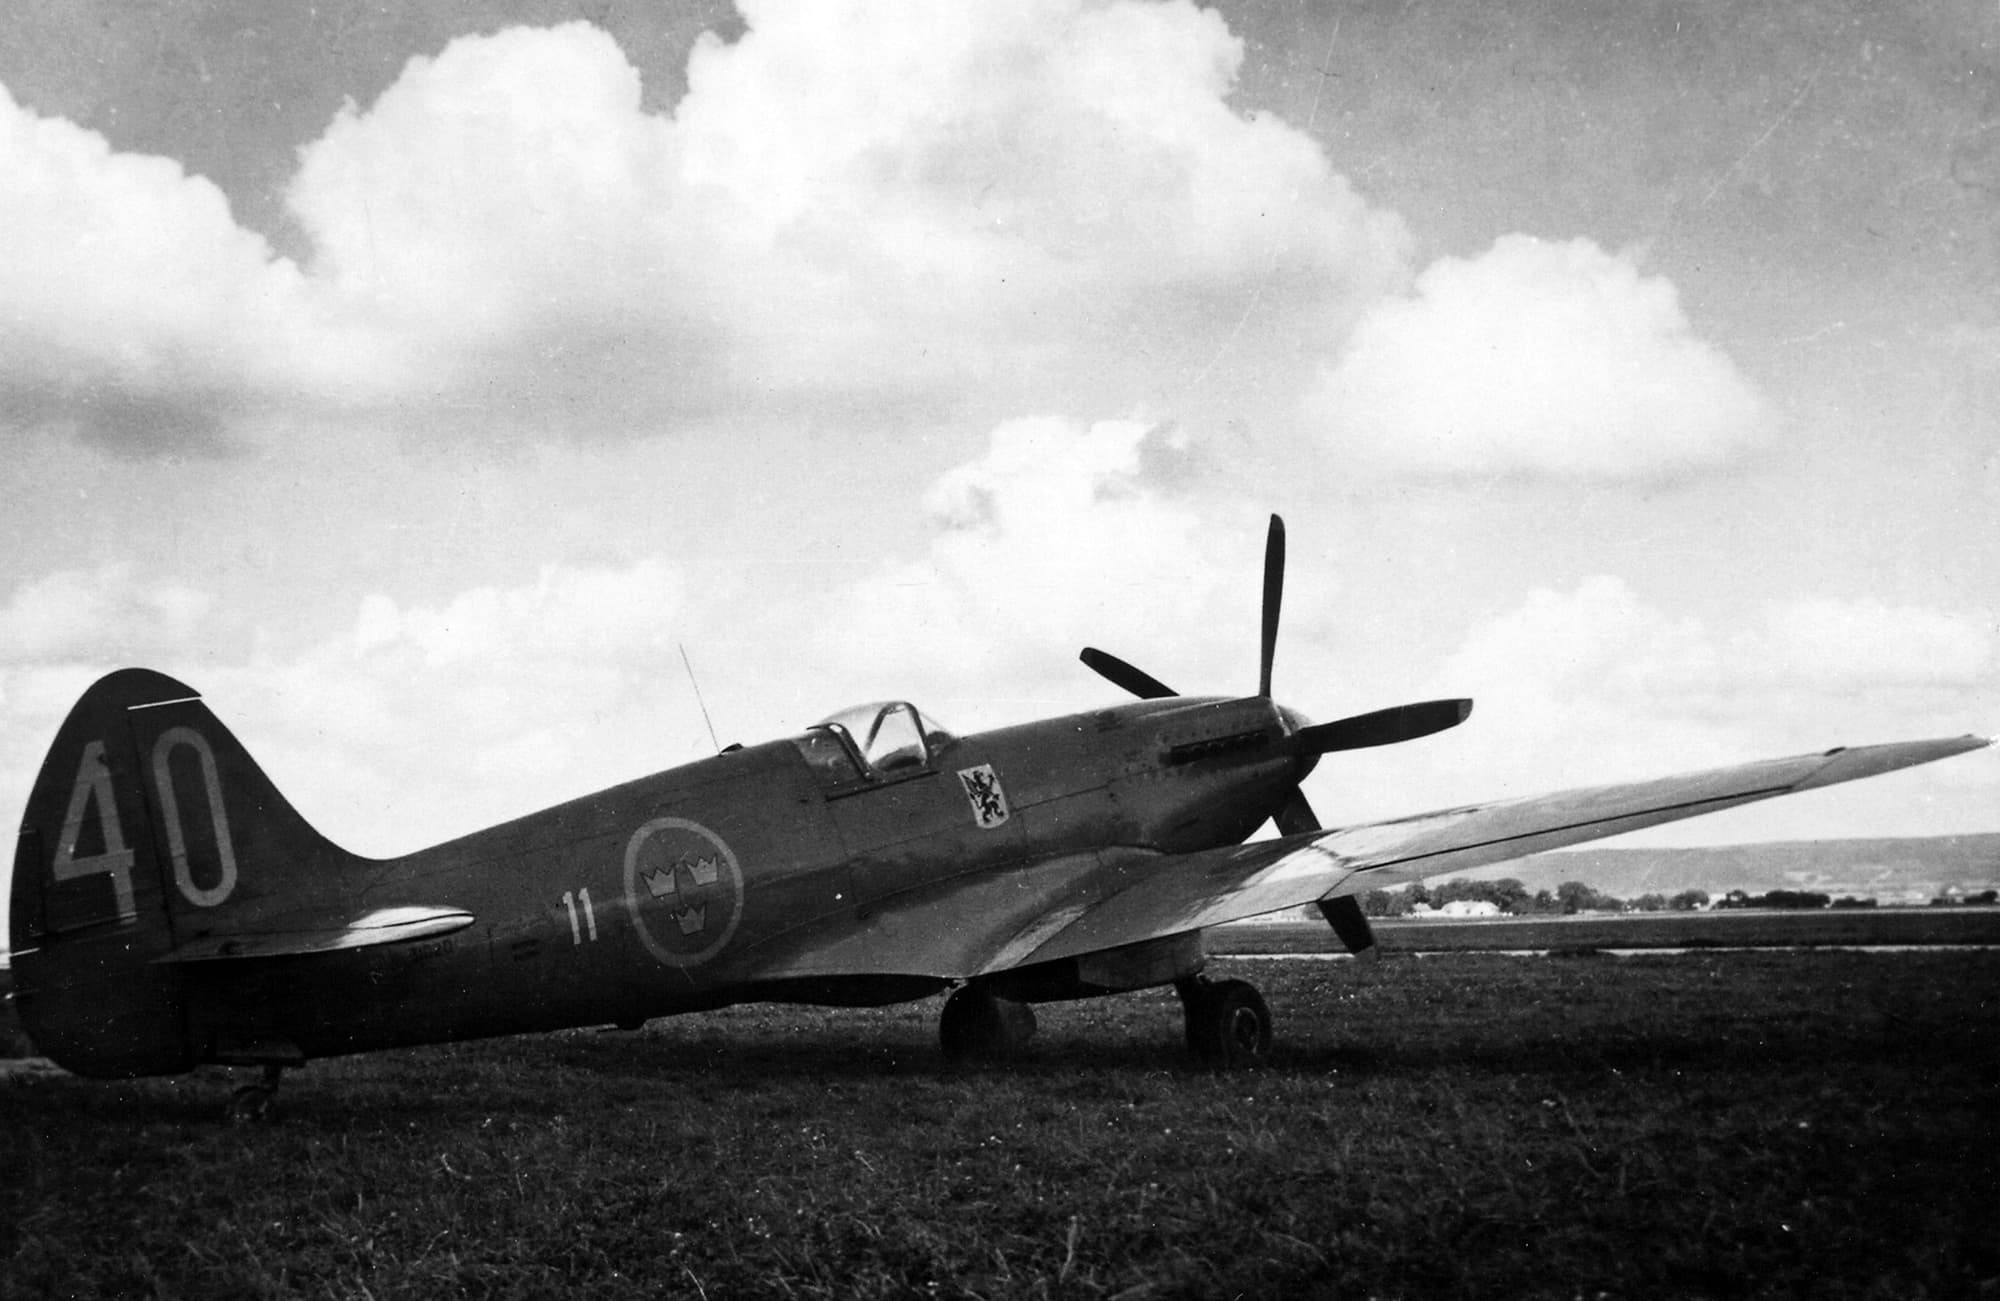 S31 Spitfire F11-40 -Leif Fredin.